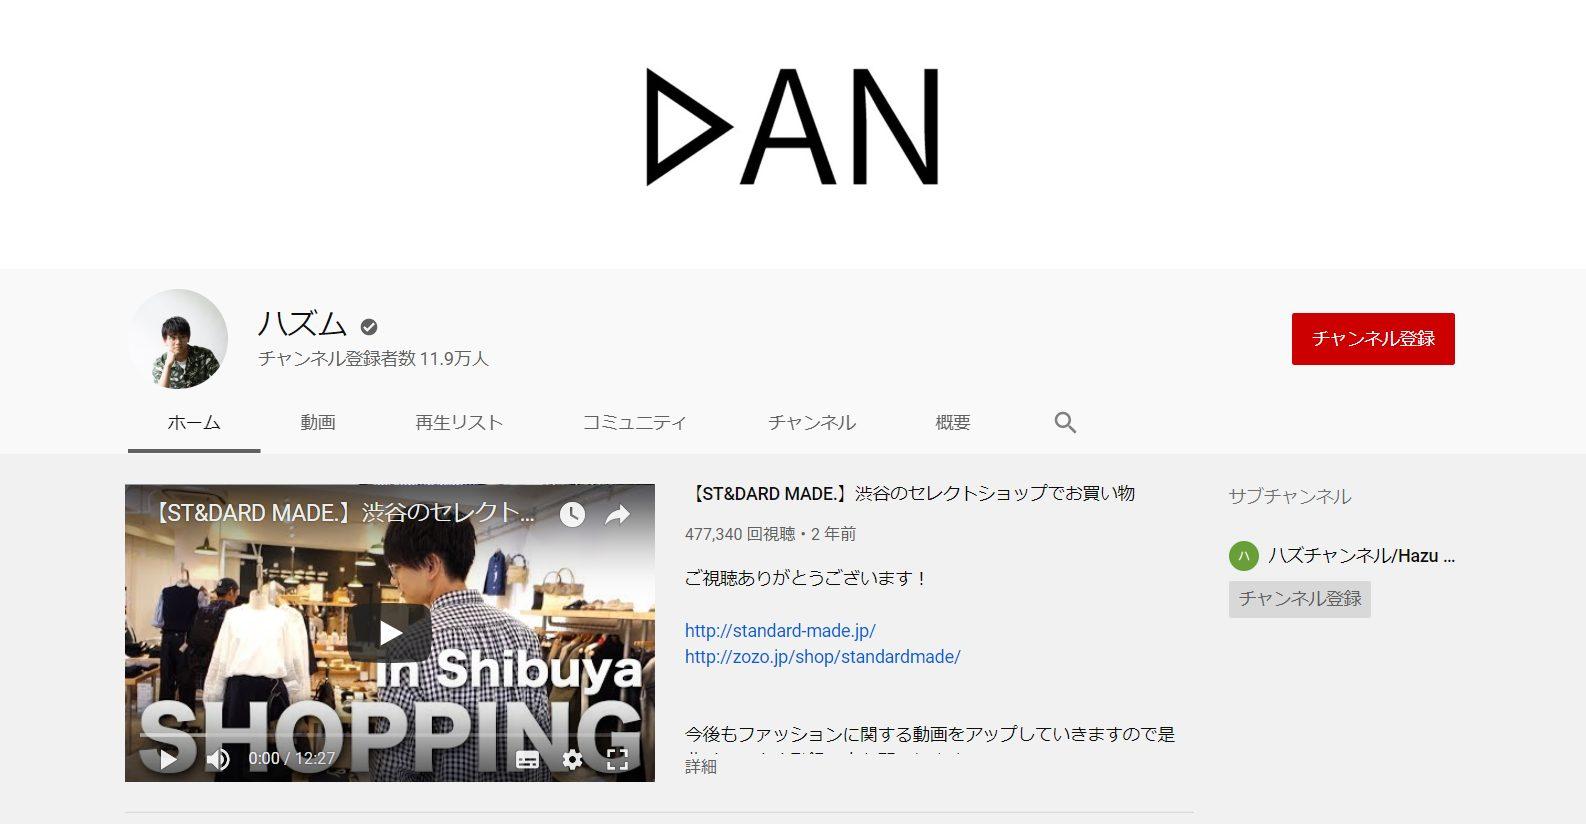 youtube-fashion-influencer-hazumu